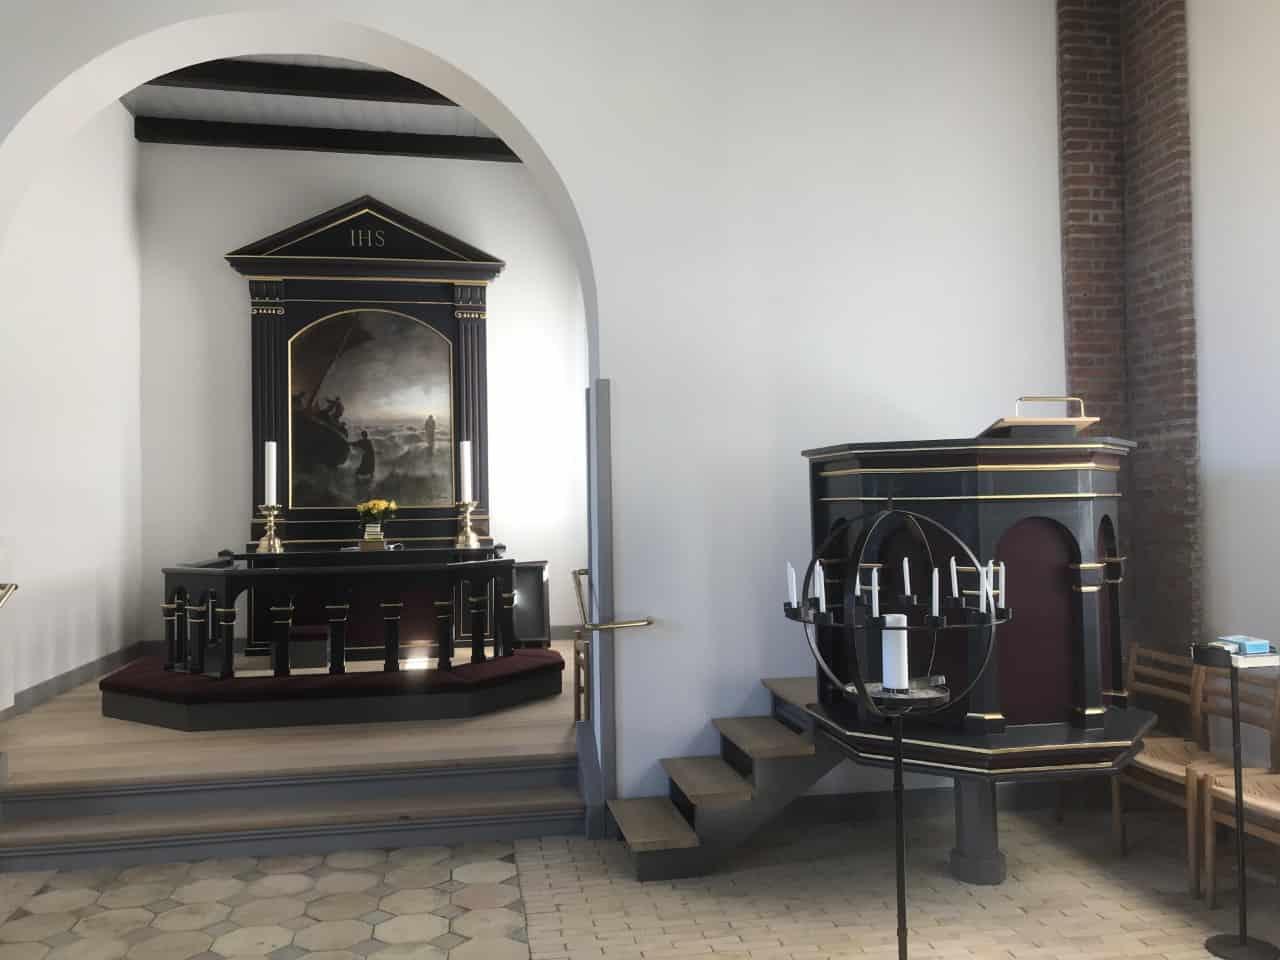 Hou Kirke talerstol altertavle